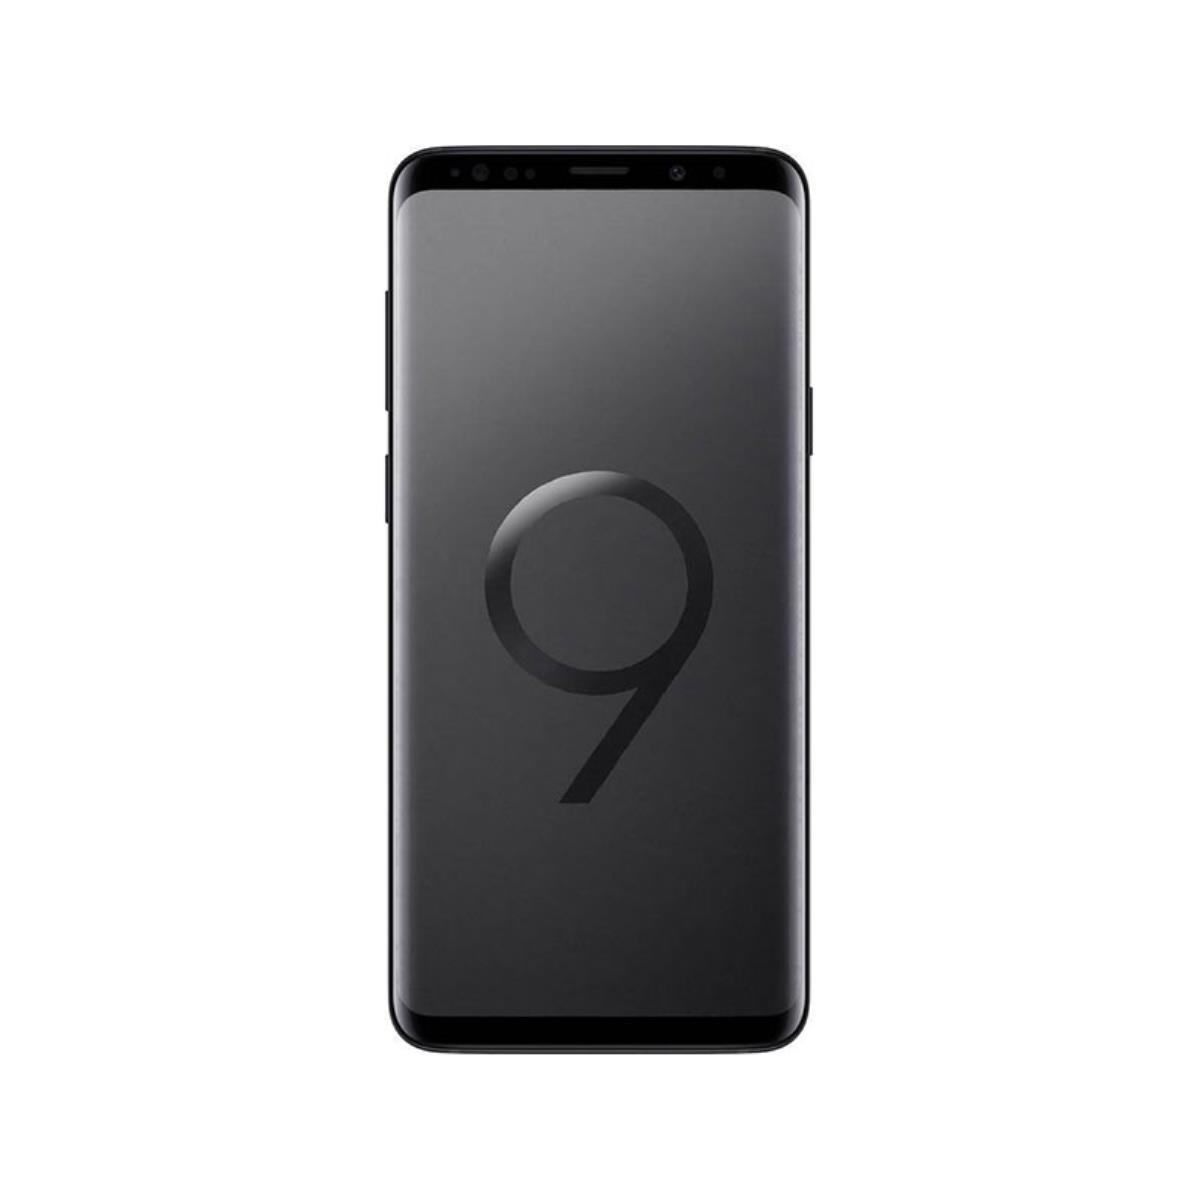 NOKIA 6.1 2018 32GB/3GB DUAL SIM BLACK